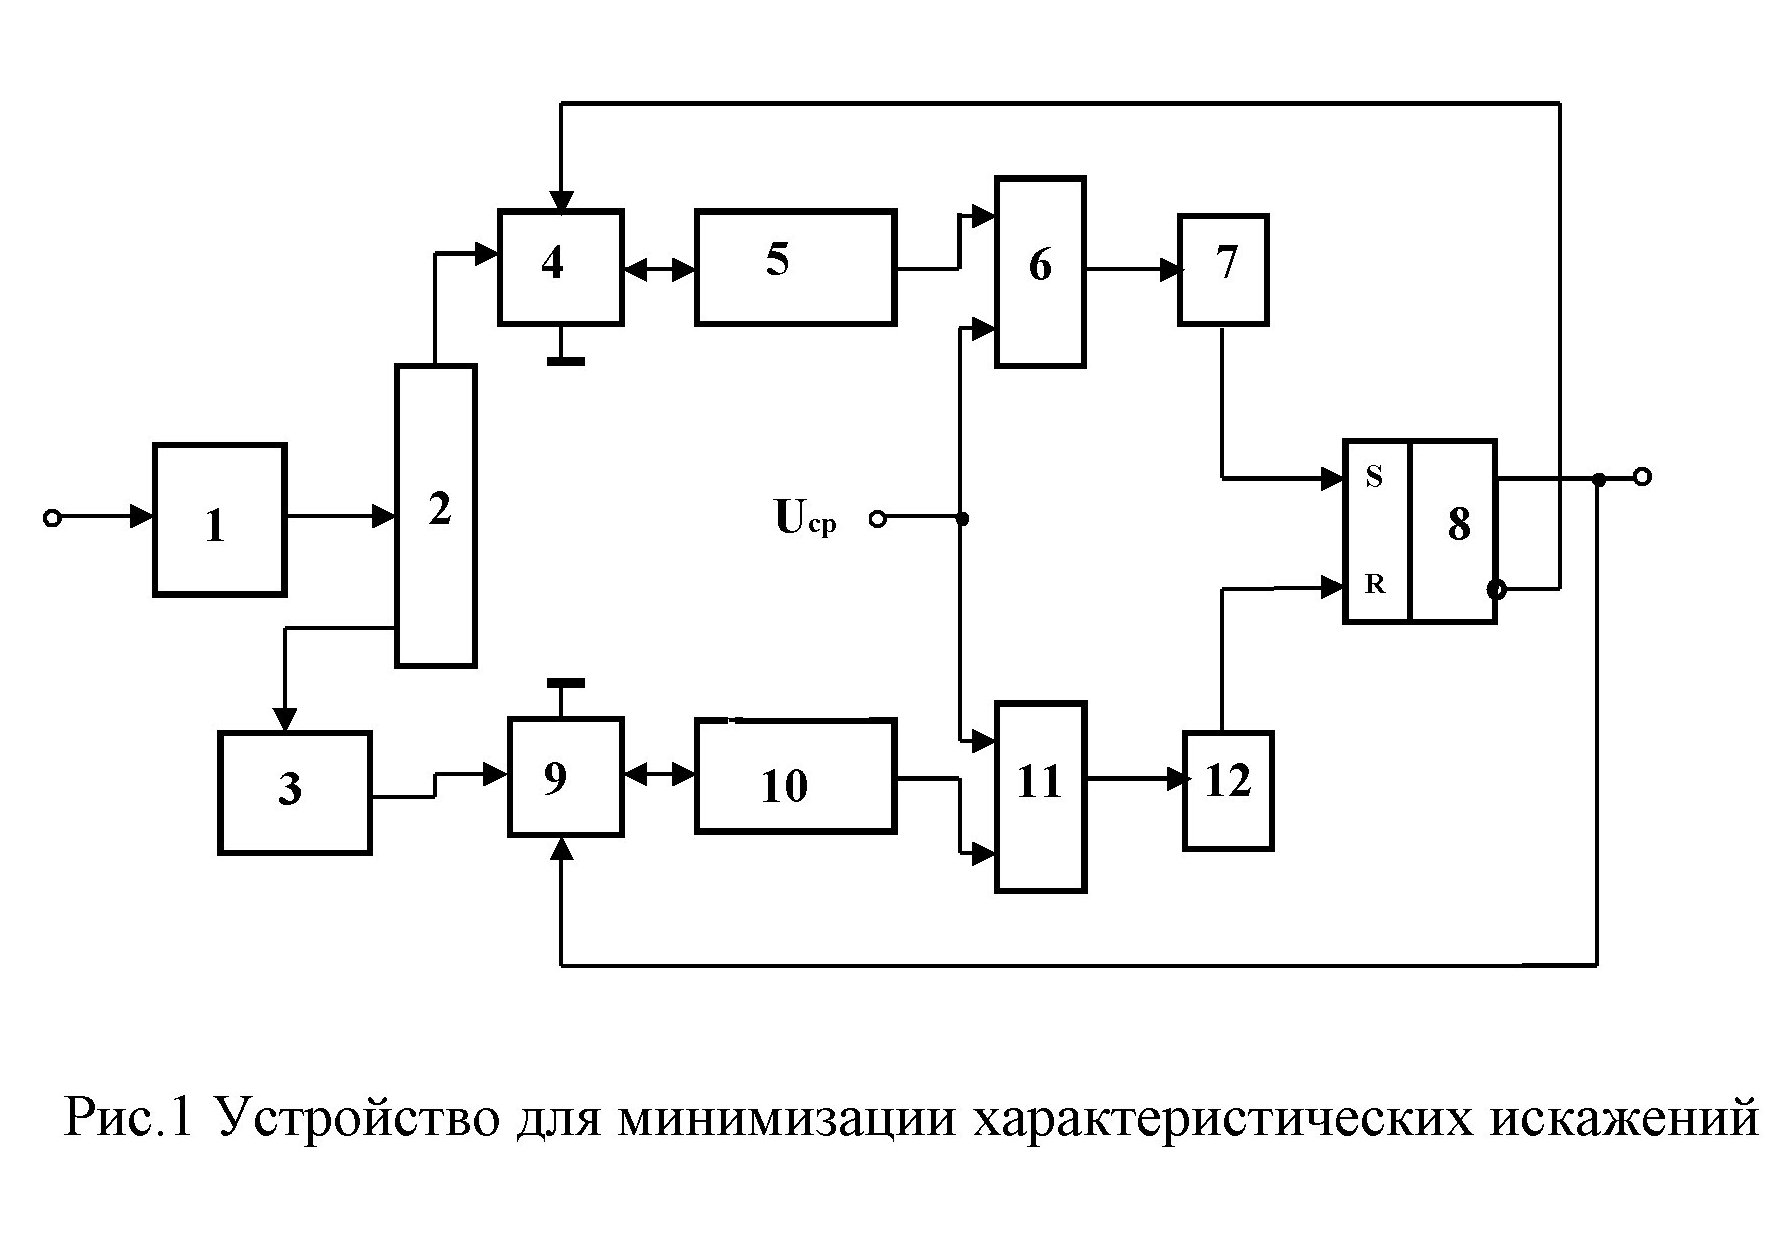 Н.Темкин Статья № 4 на сайт (1.1)